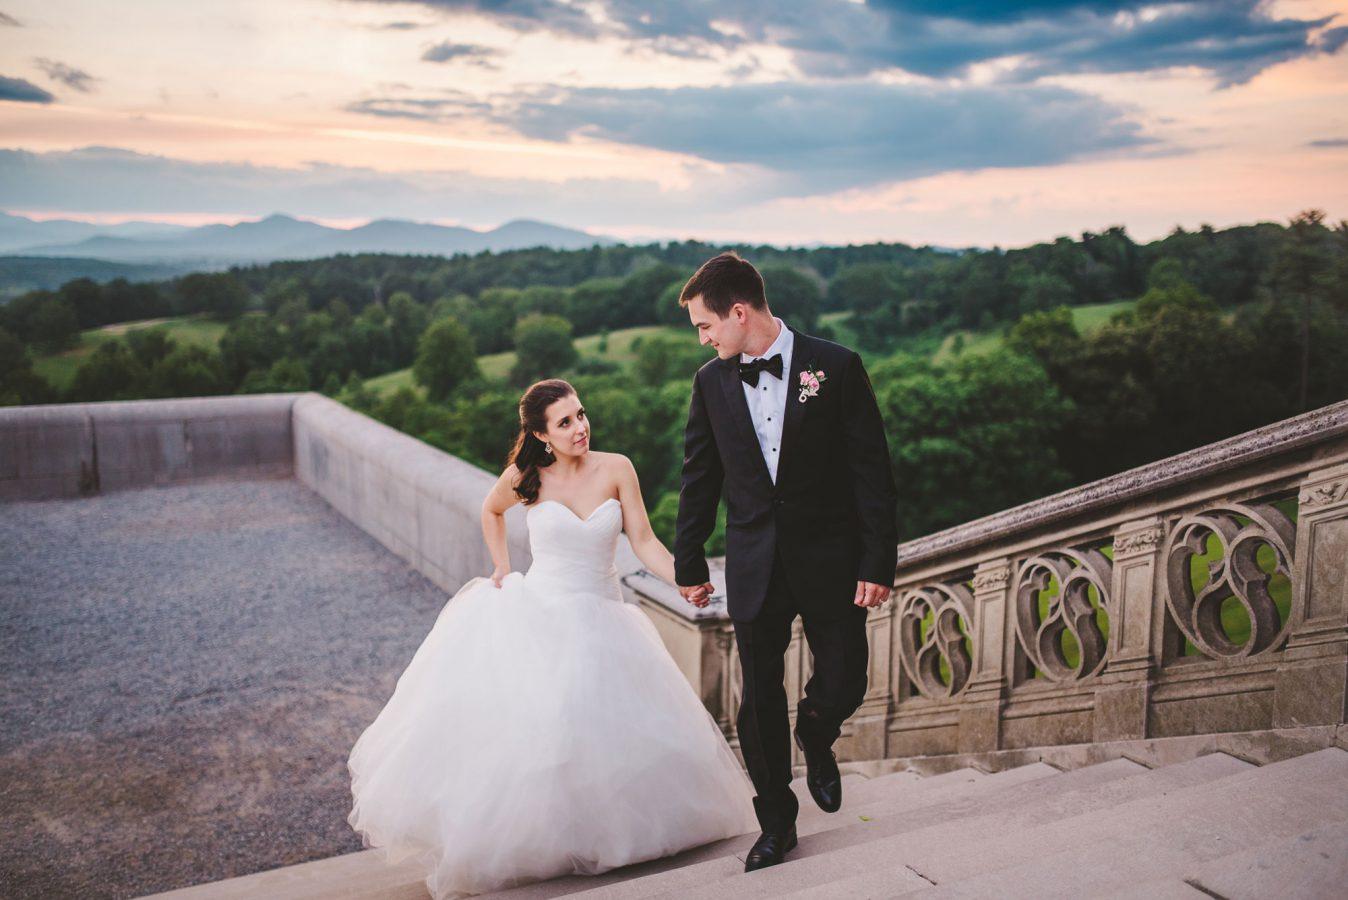 fete-photography-weddings-2017-015